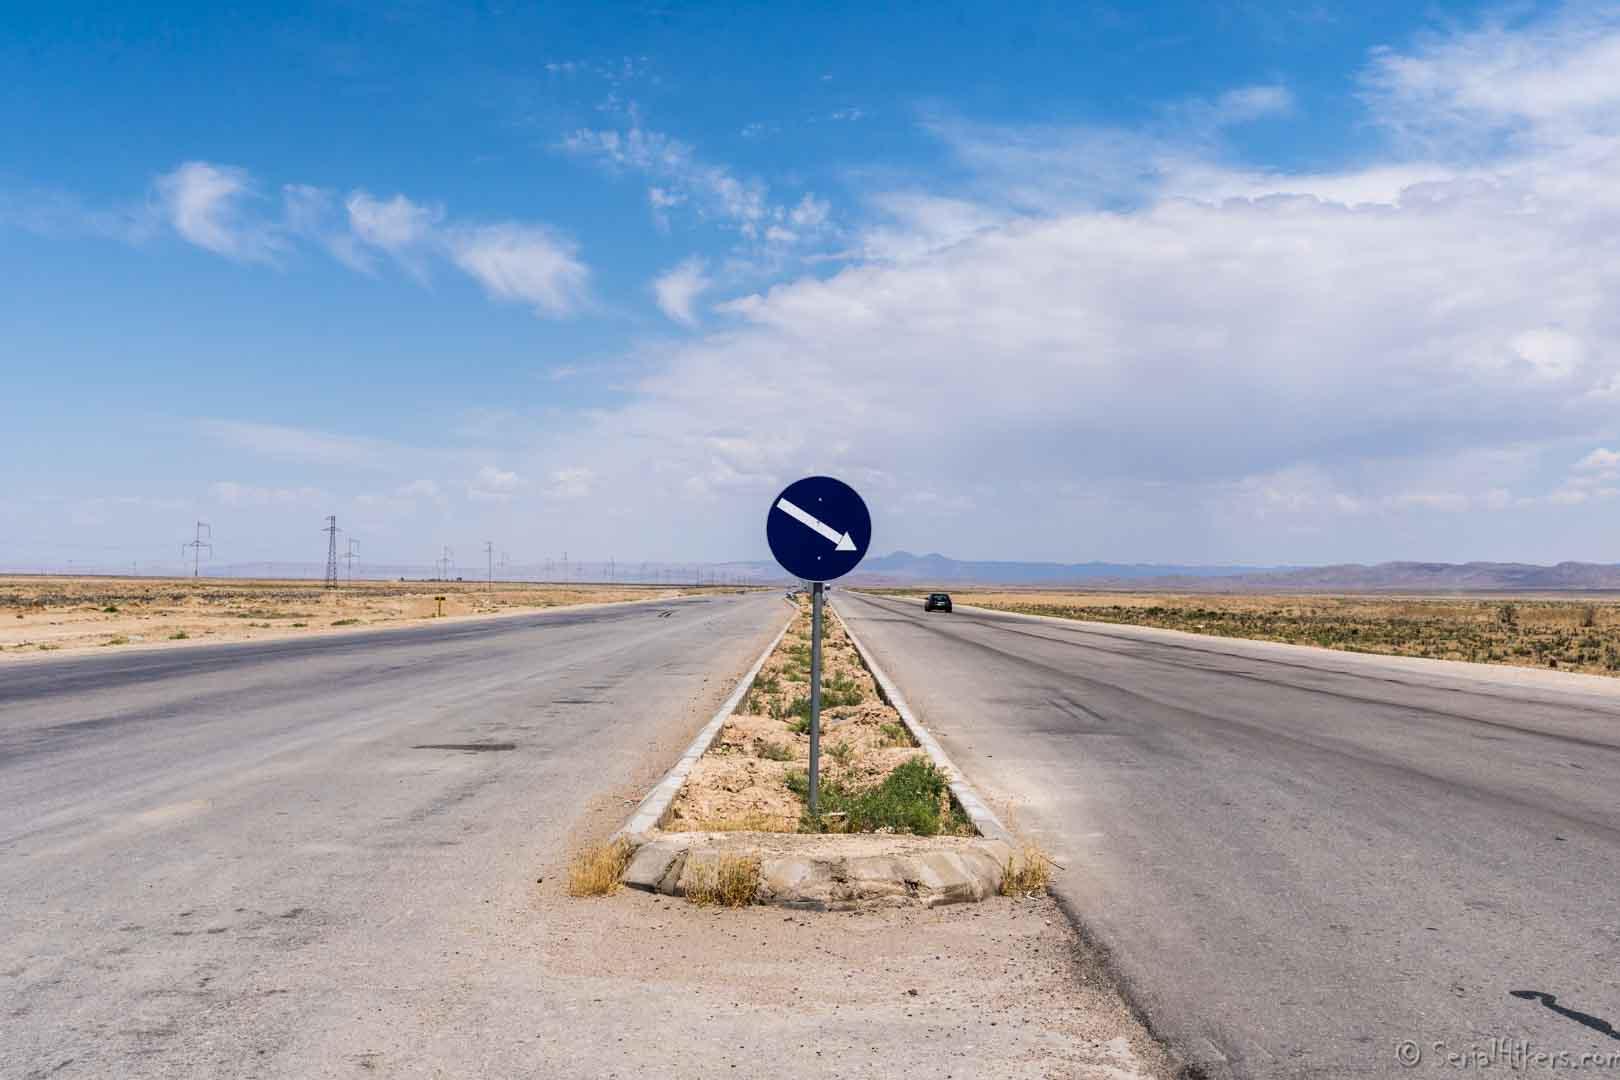 SerialHikers stop autostop world monde tour hitchhiking aventure adventure alternative travel voyage sans avion no fly balkanabat bektash transit turkmenistan